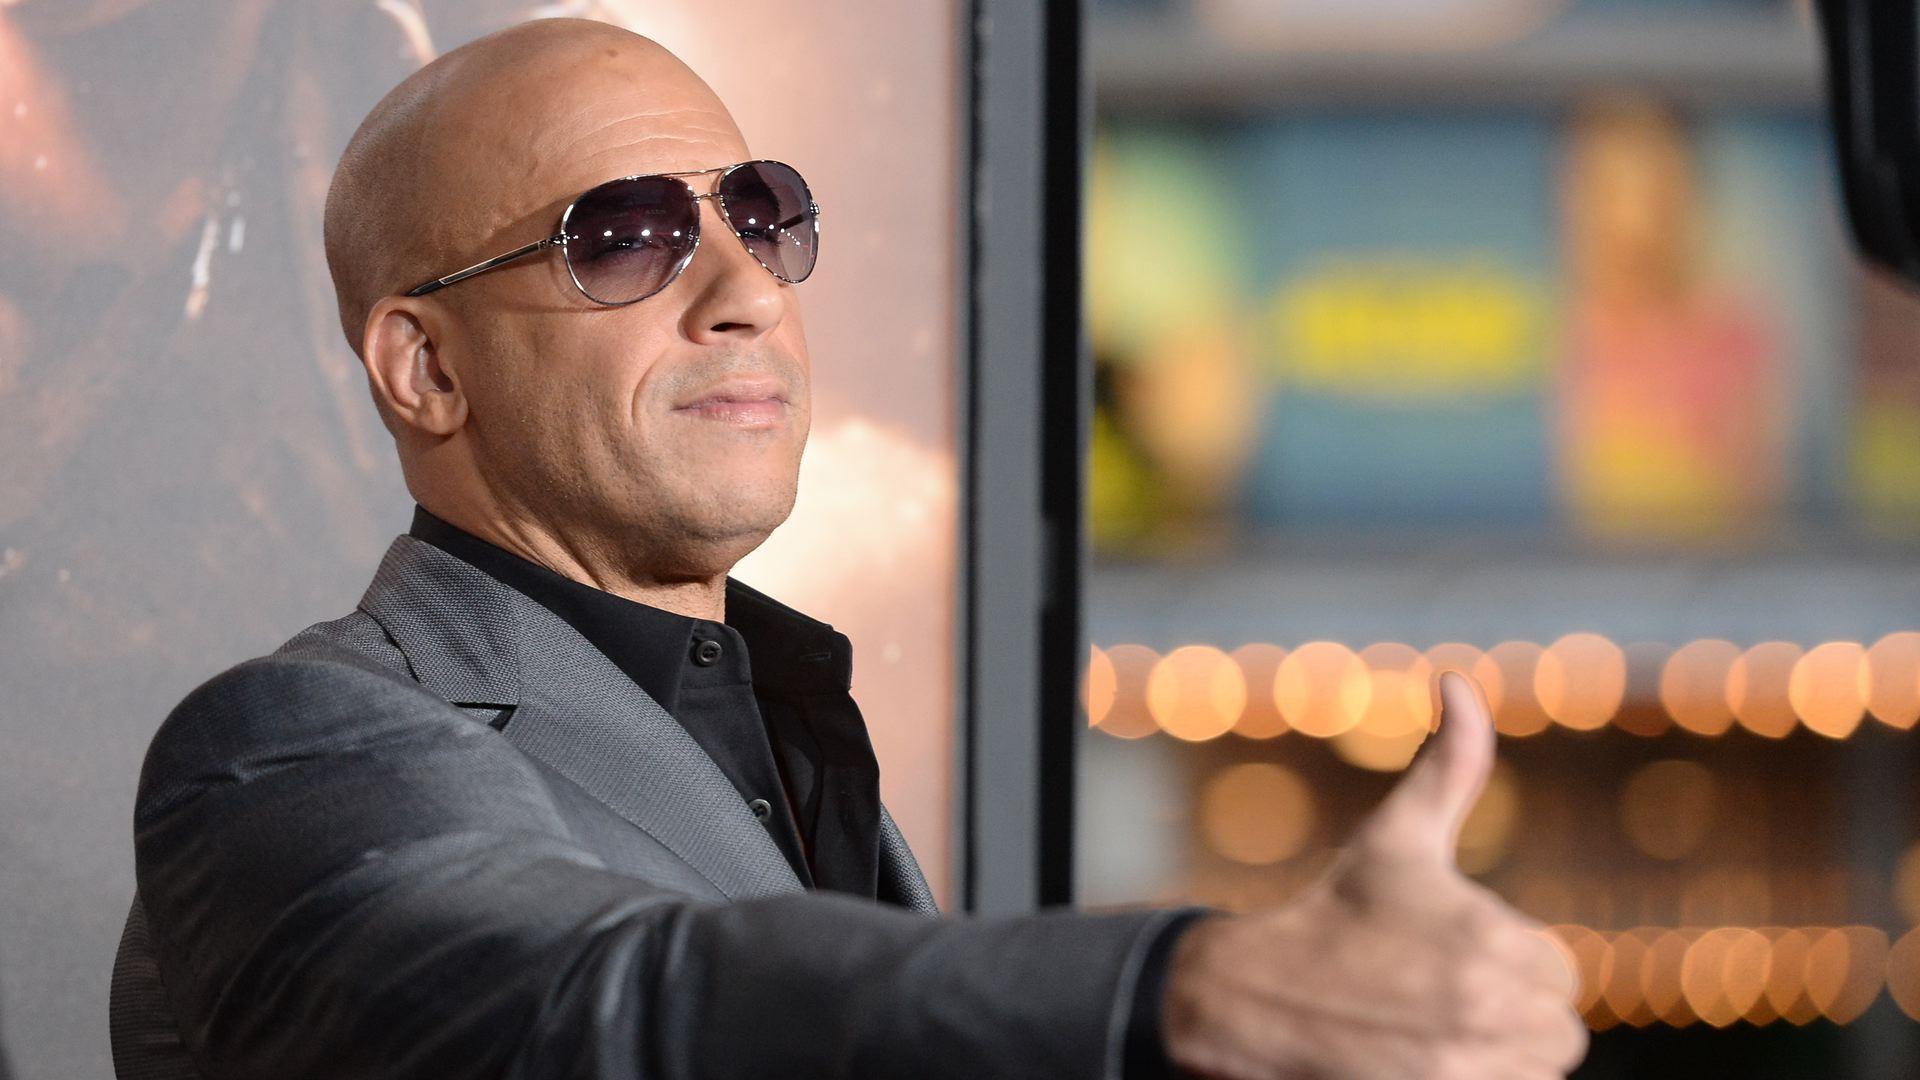 Vin Diesel In Fast Five Wallpaper Prateak Movie Review 1920x1080